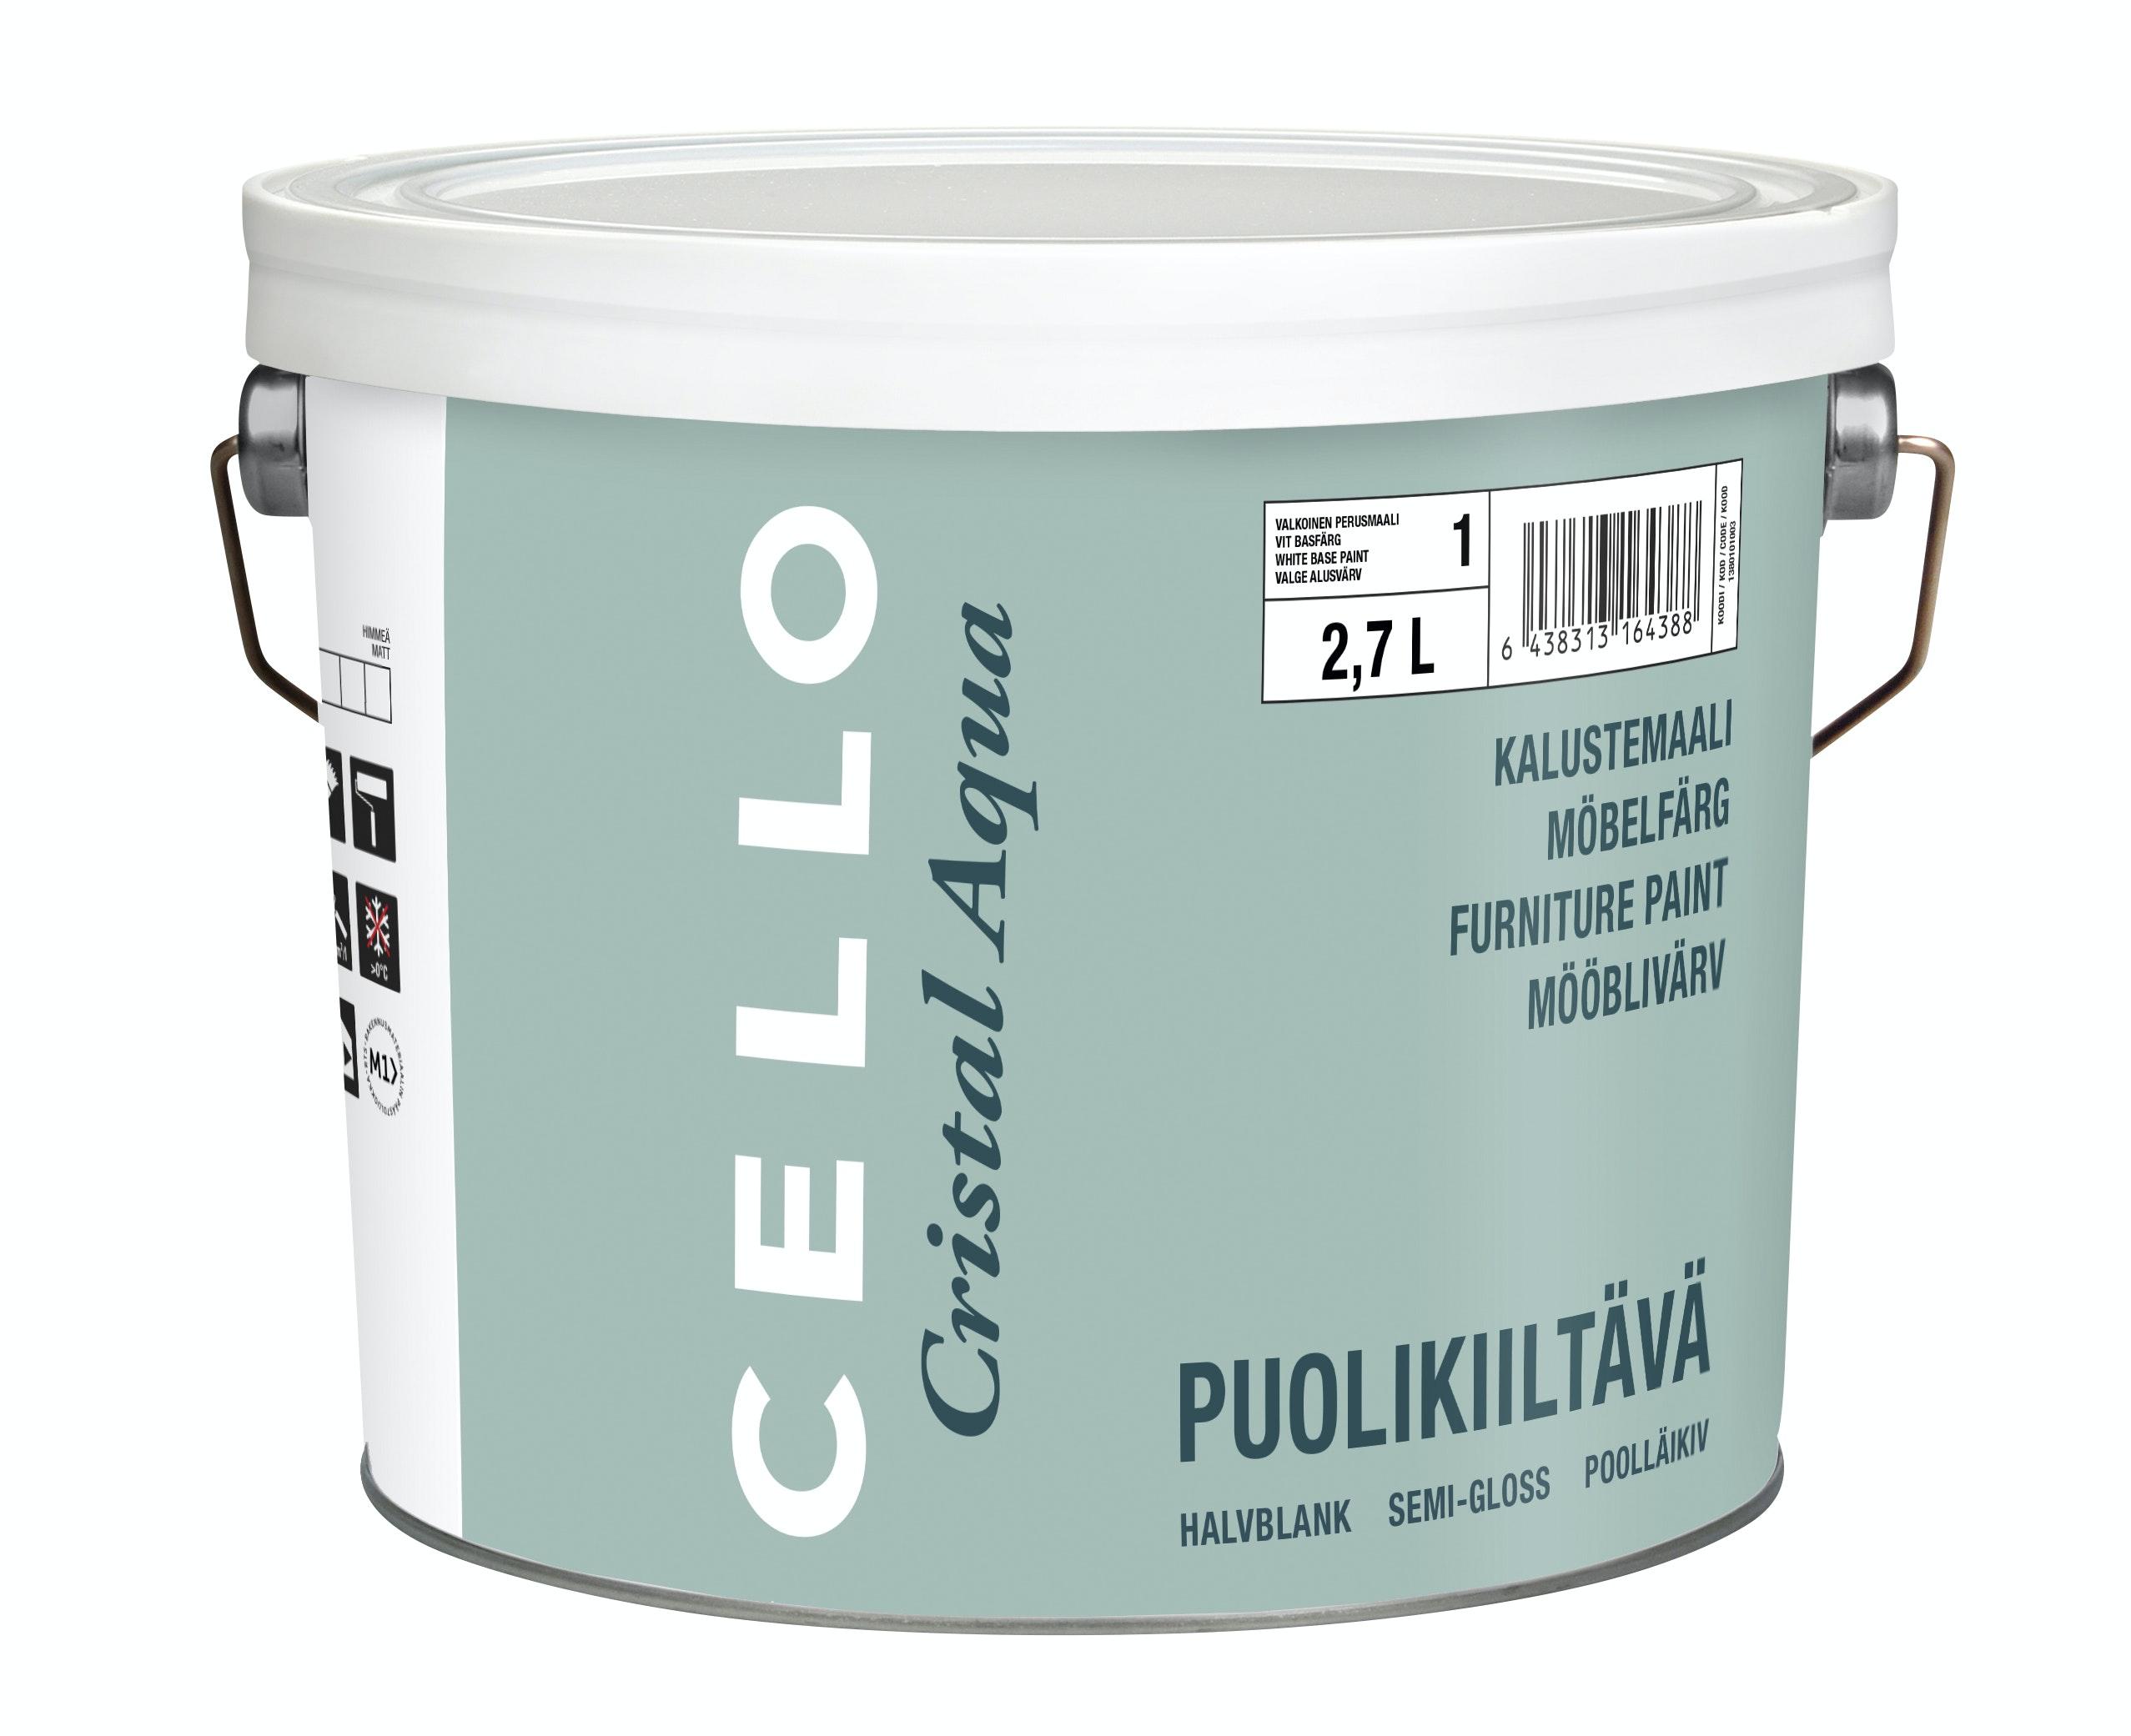 Snickerifärg Cello Cristal Aqua Halvblank Vit/Bas 1 2,7l